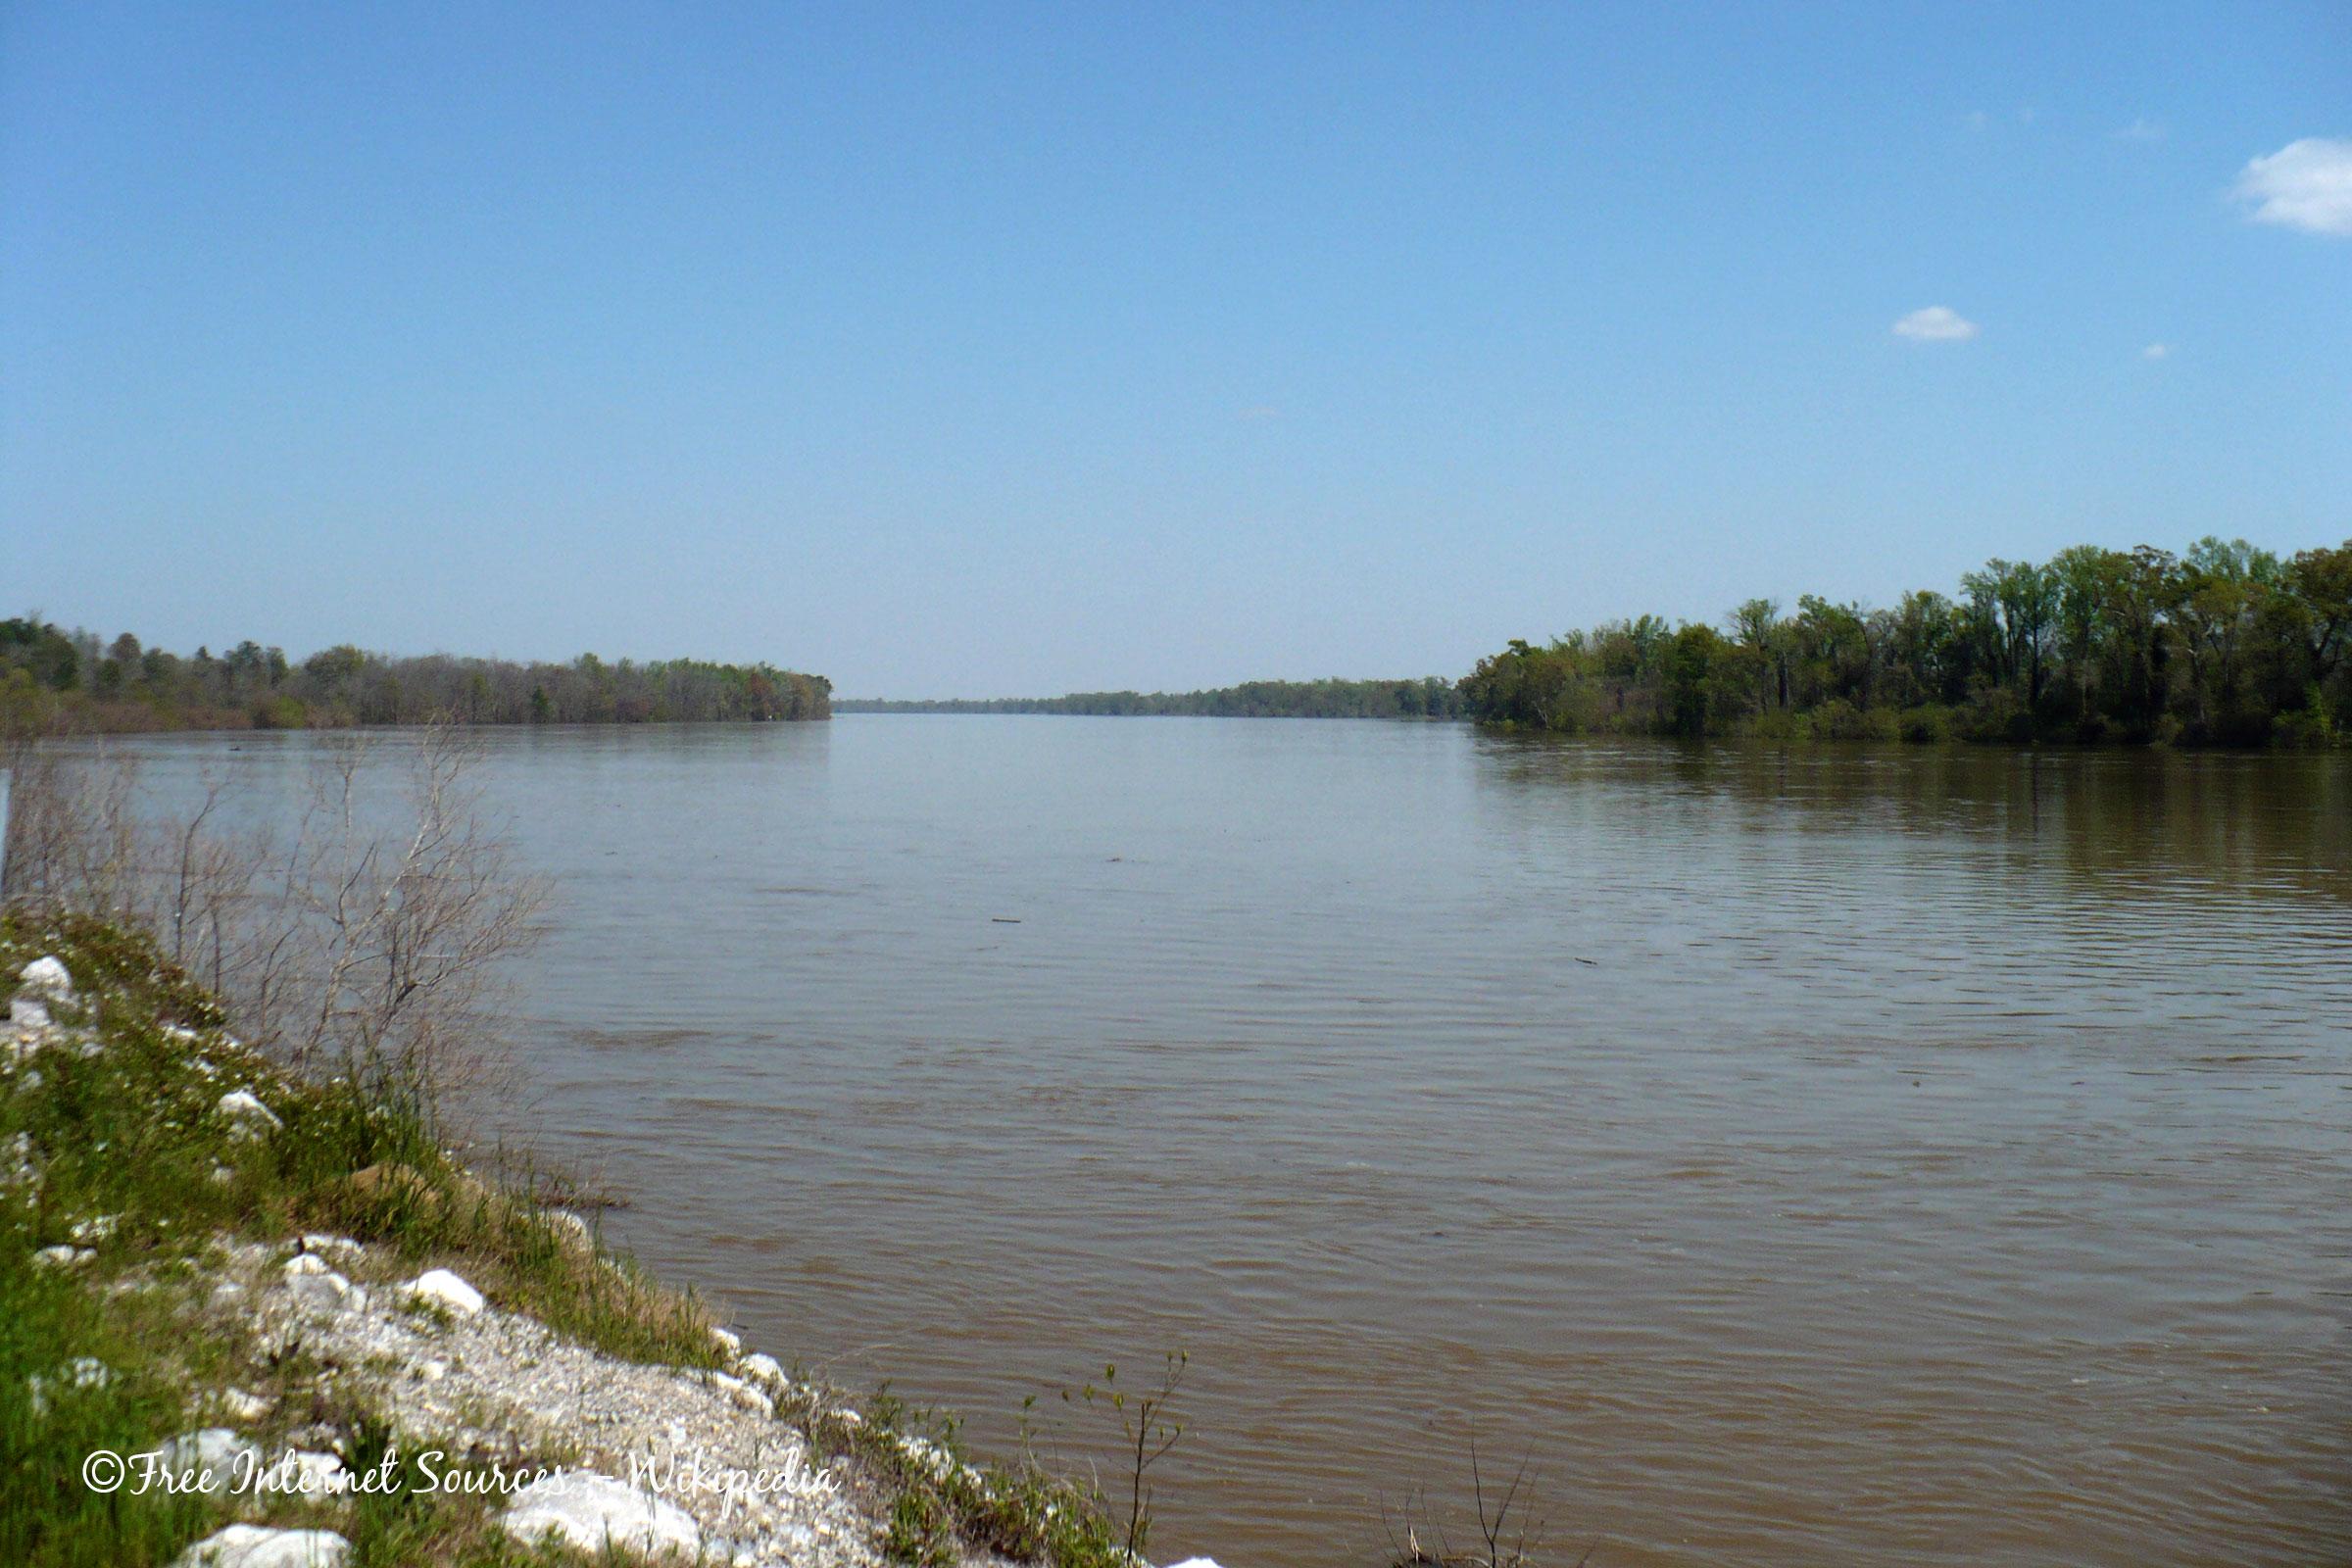 Mobile River, Alabama, USA.